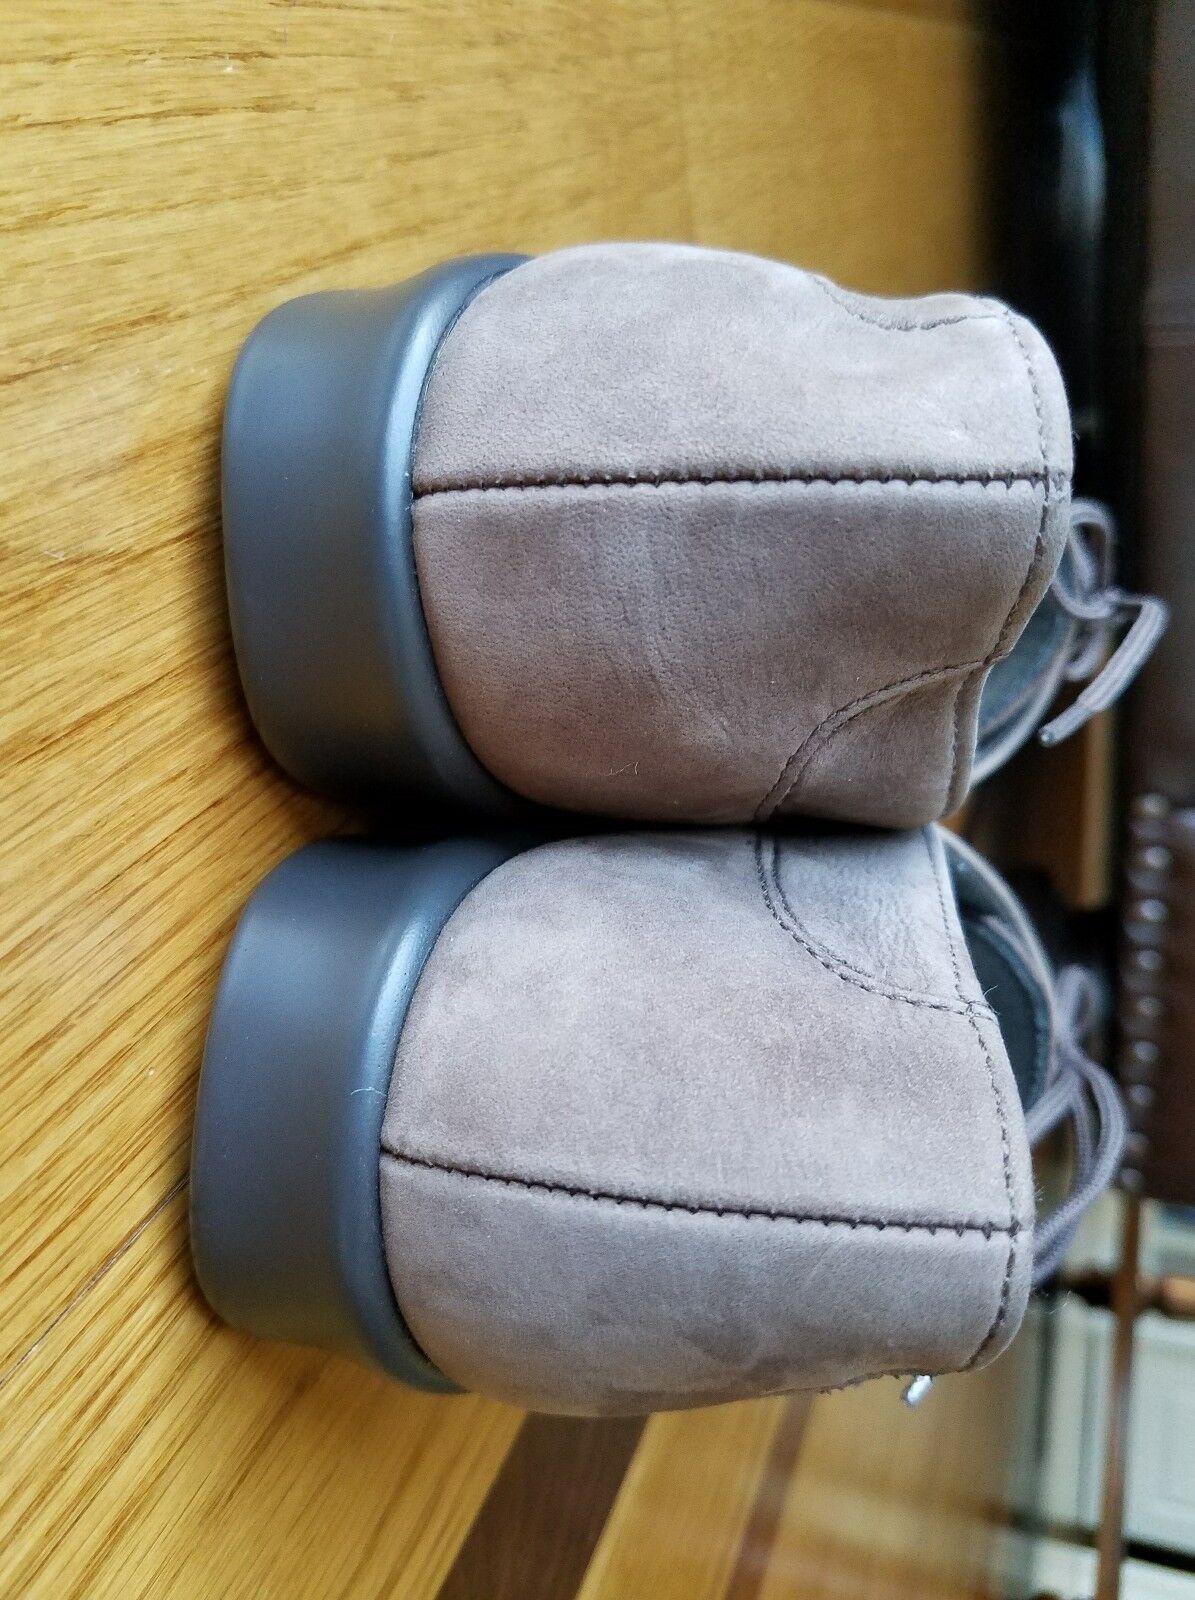 SAS Woman's PETRA Truffle Taupe Braun Lace Suede/Nubuck Lace Braun Up Moccasin Wide Sz 7 W a6c6da